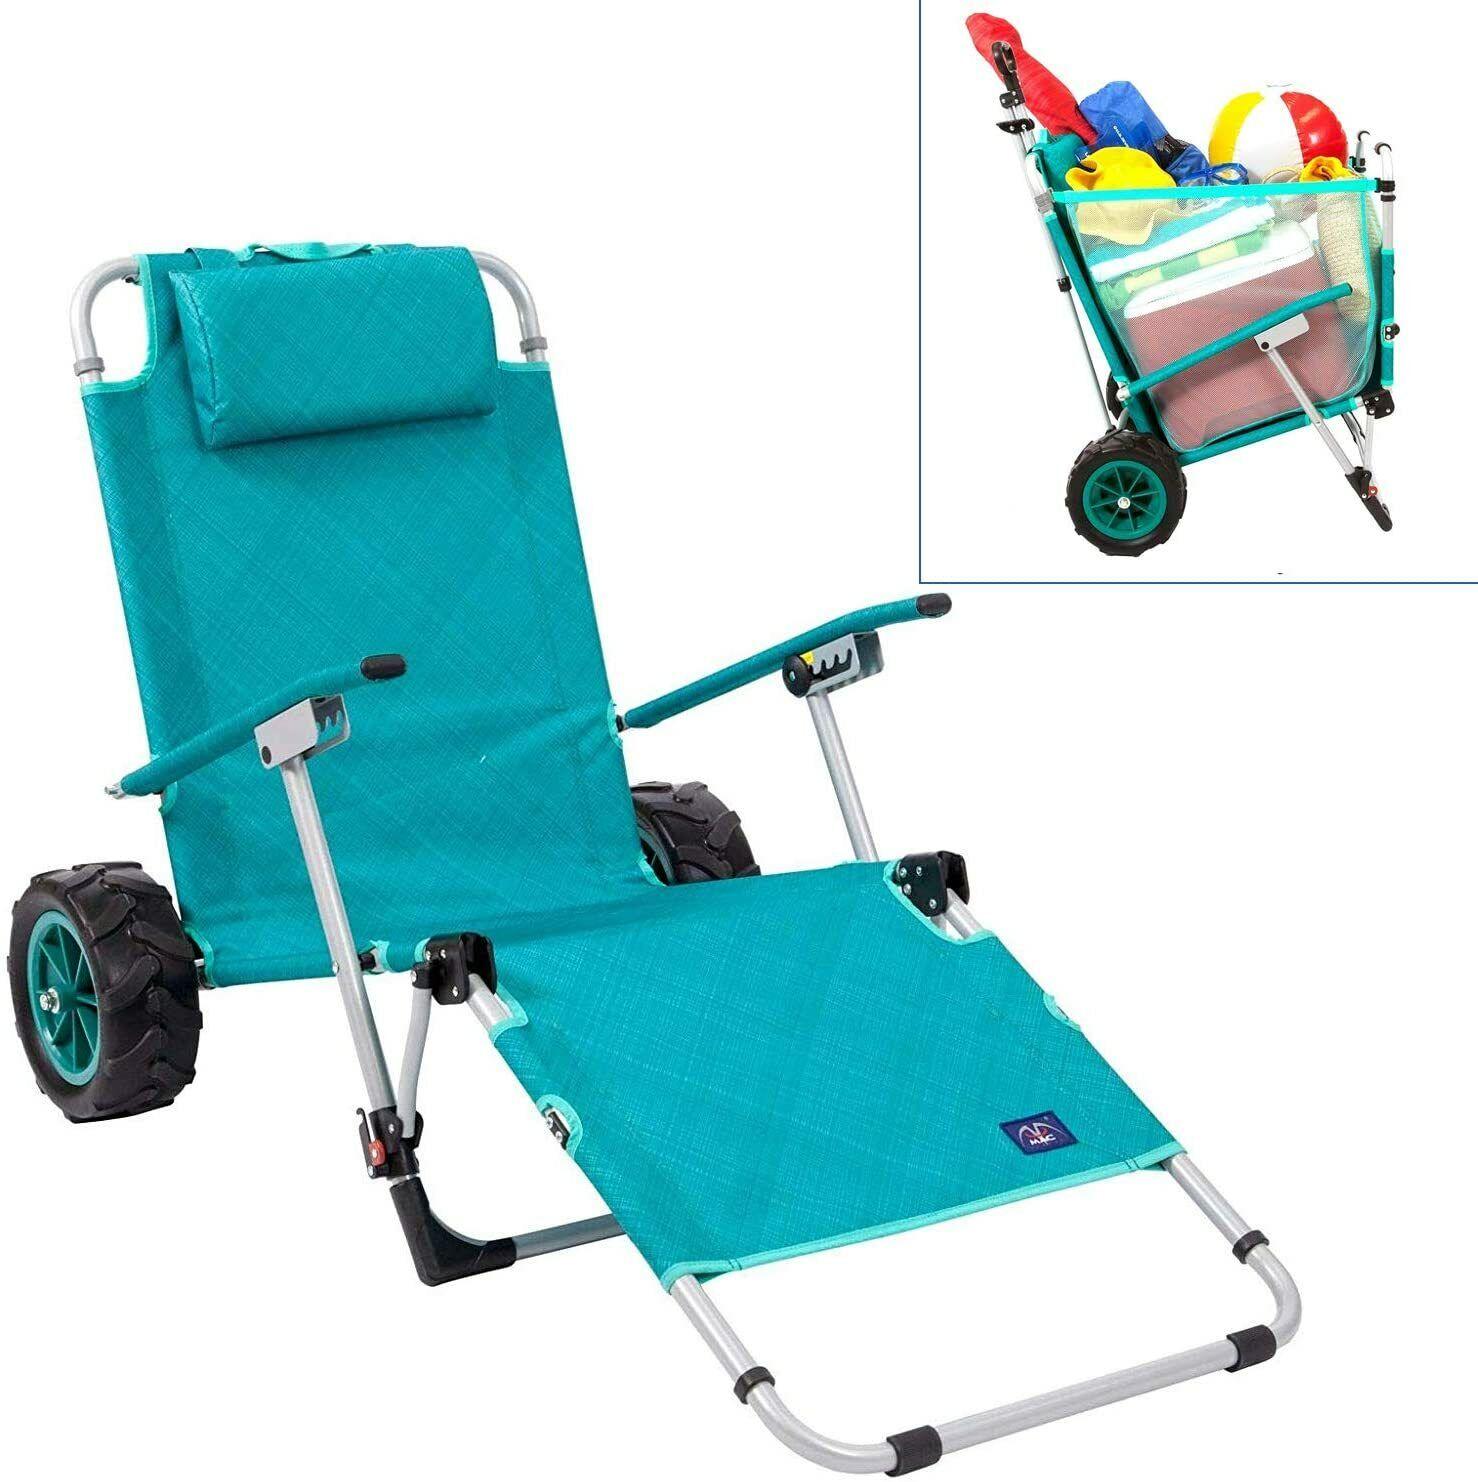 Mac Sports Beach Day Convertible Lounger Chair with Integrat